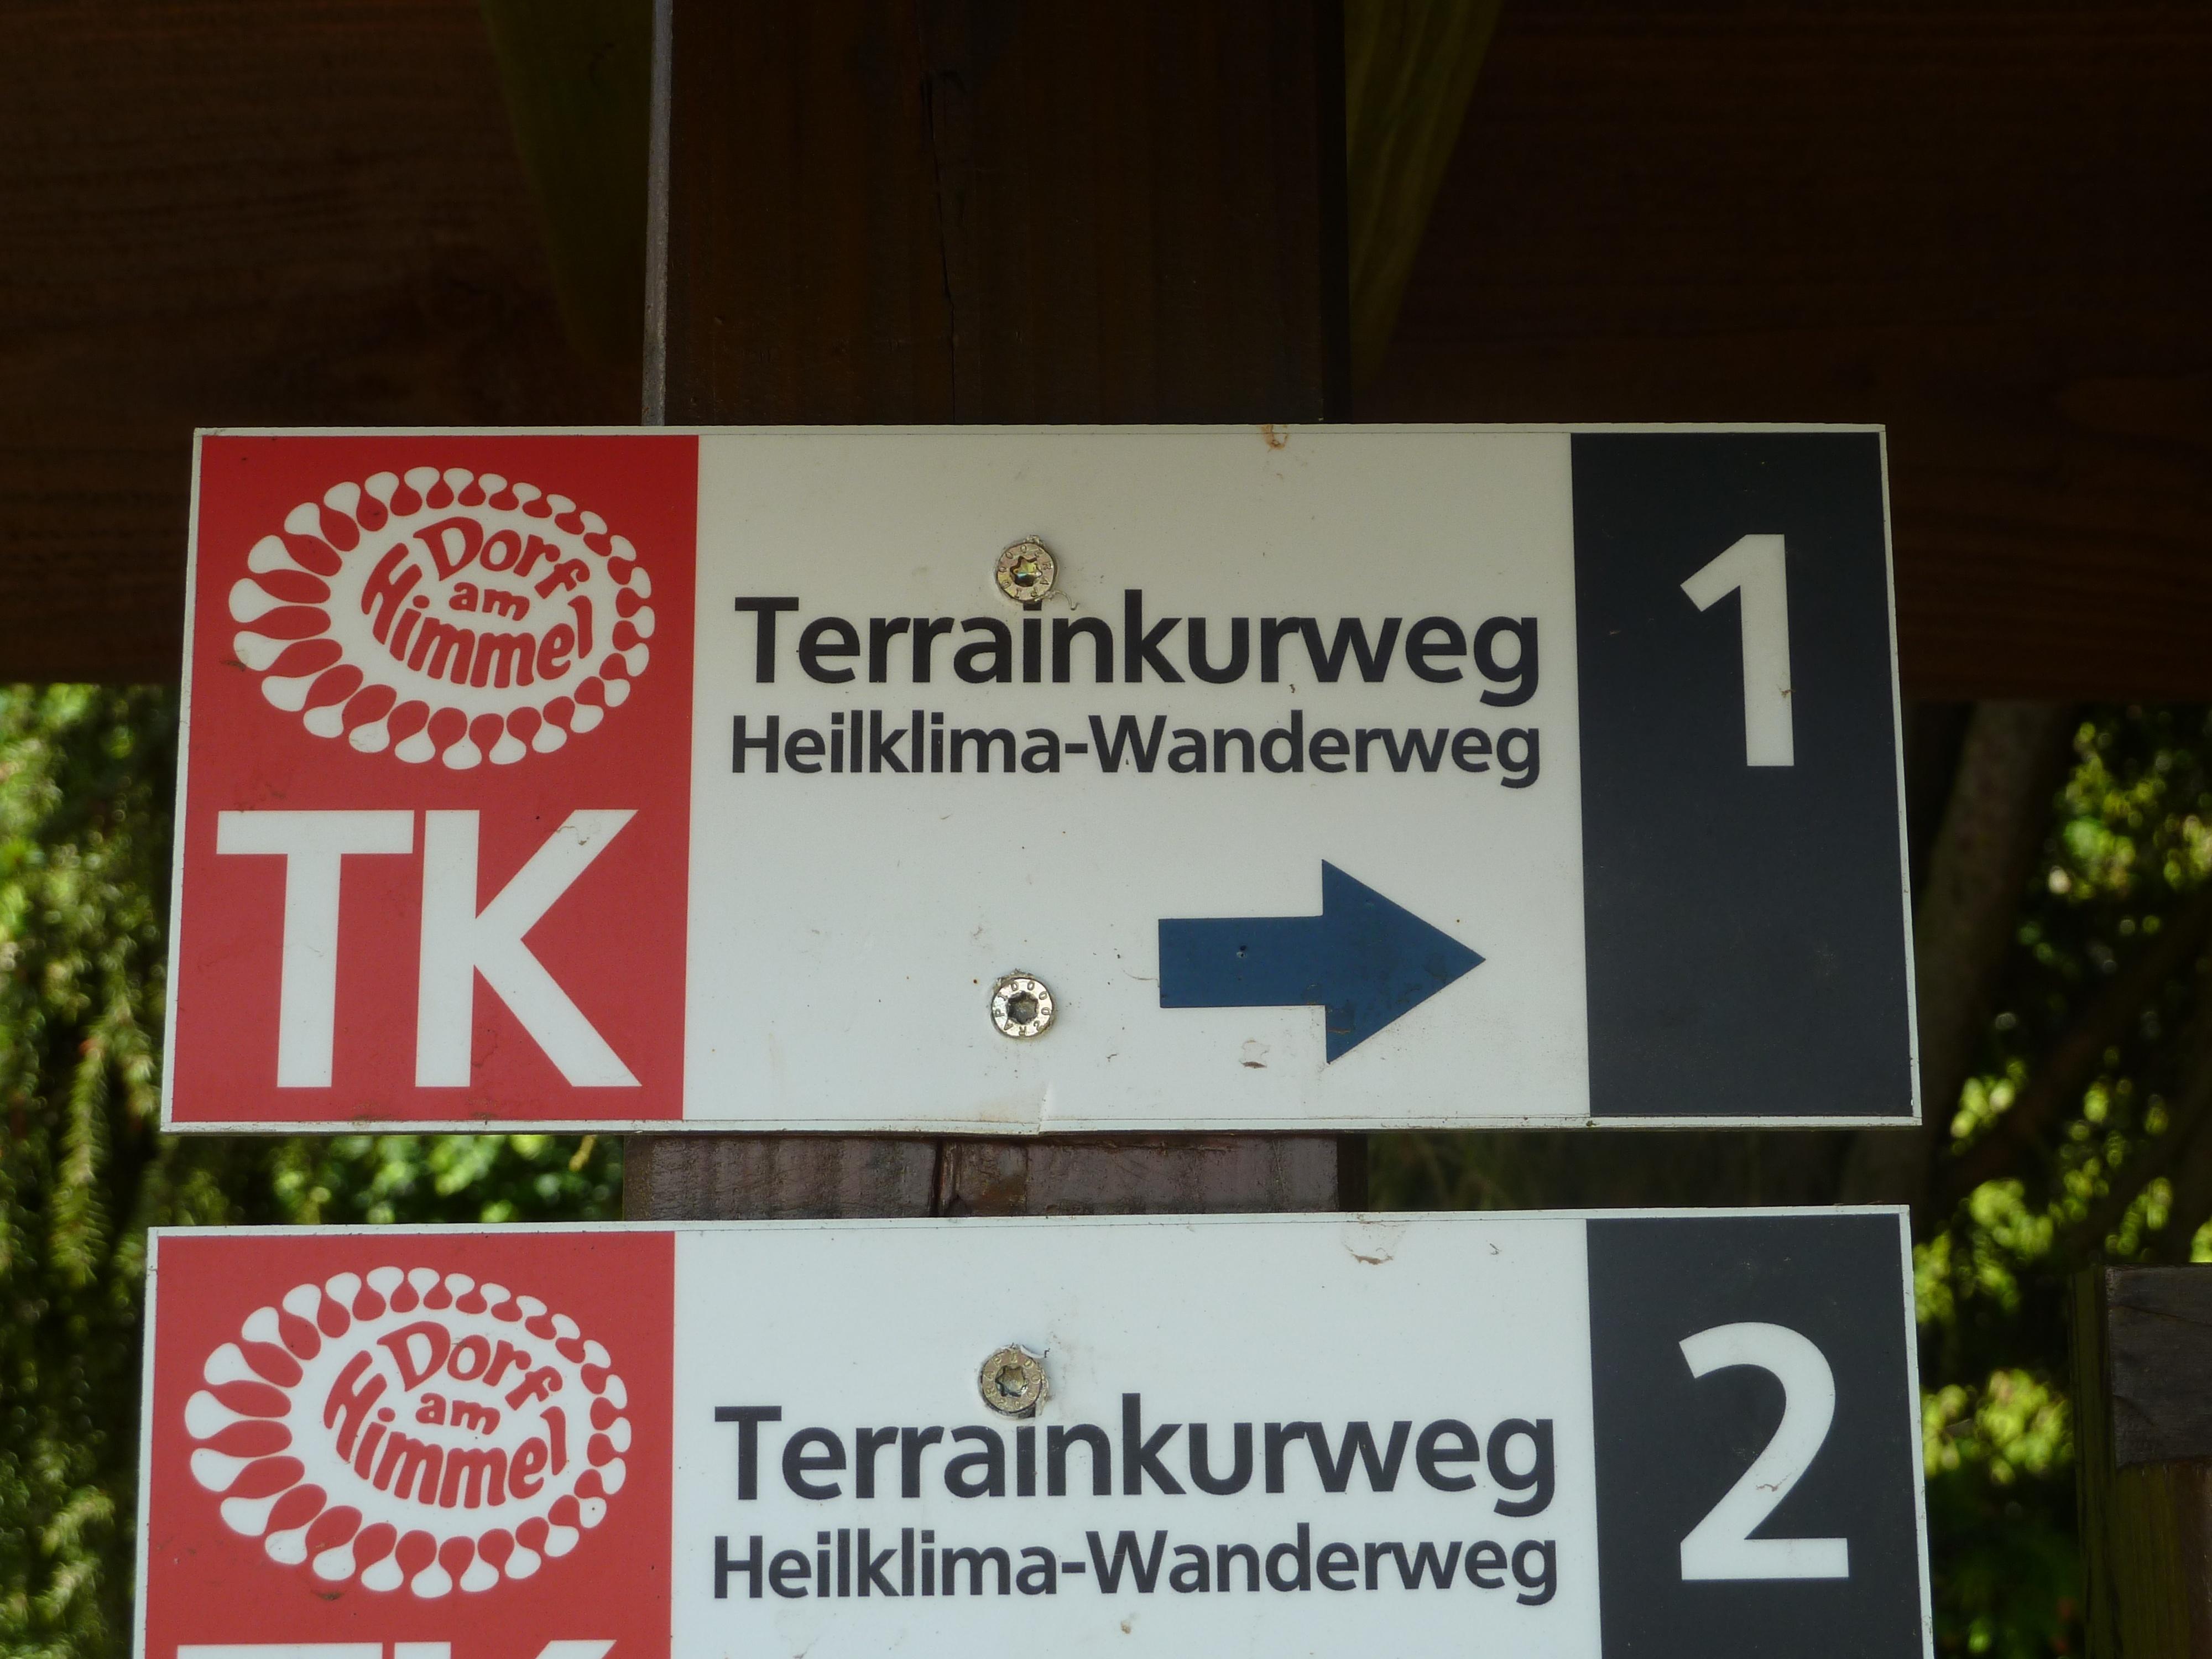 Wegbeschilderung TK 1